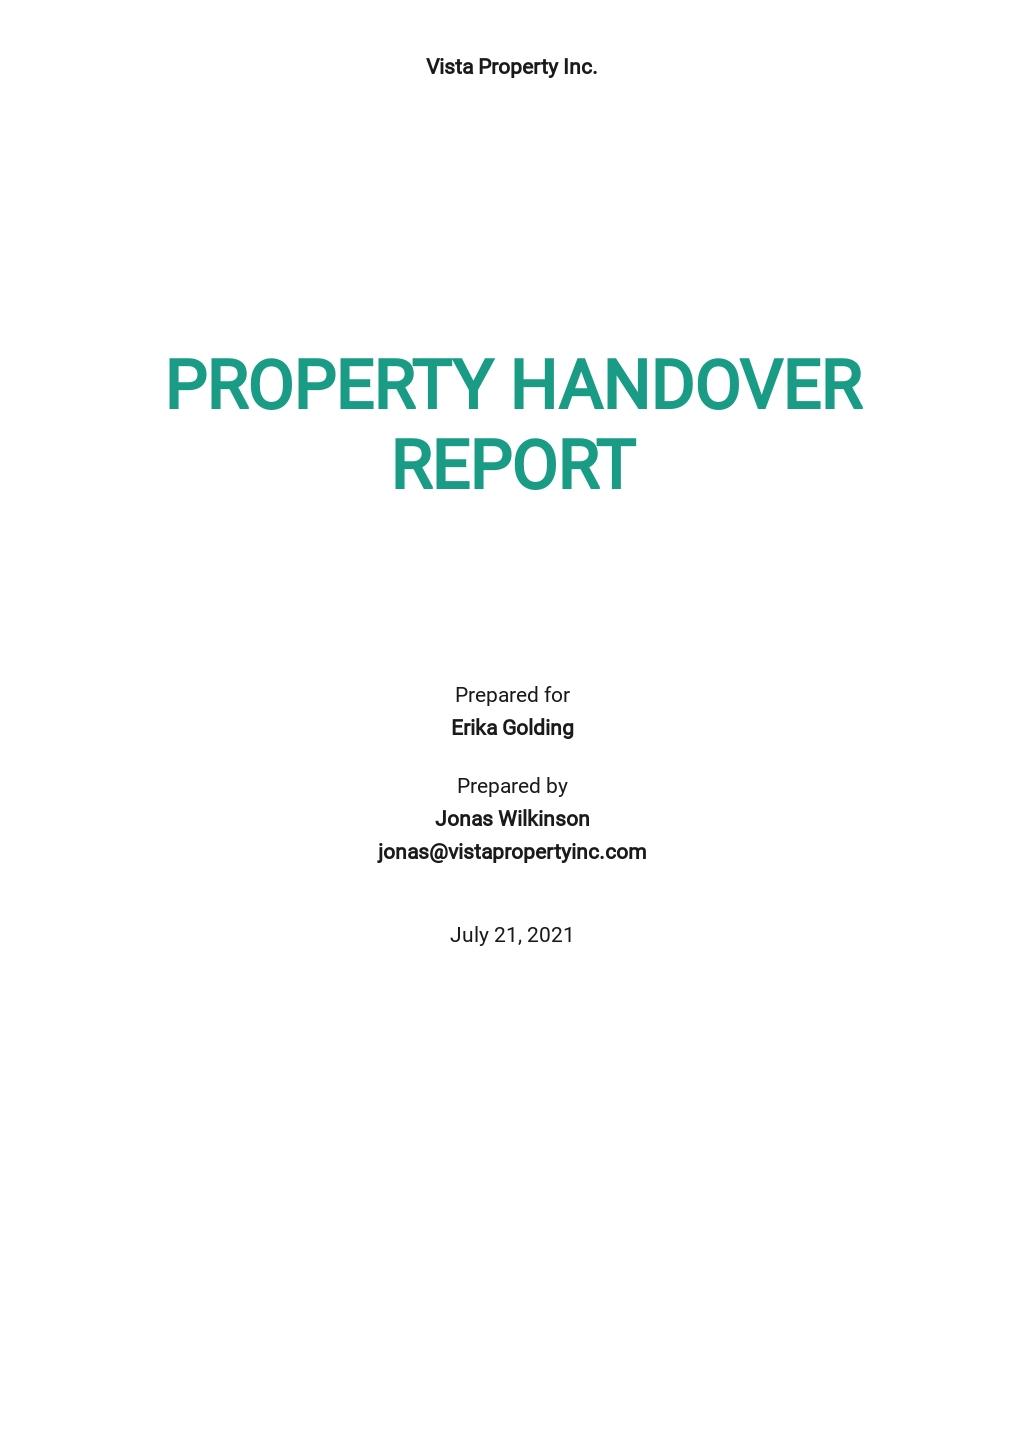 Free Property Handover Report Template.jpe